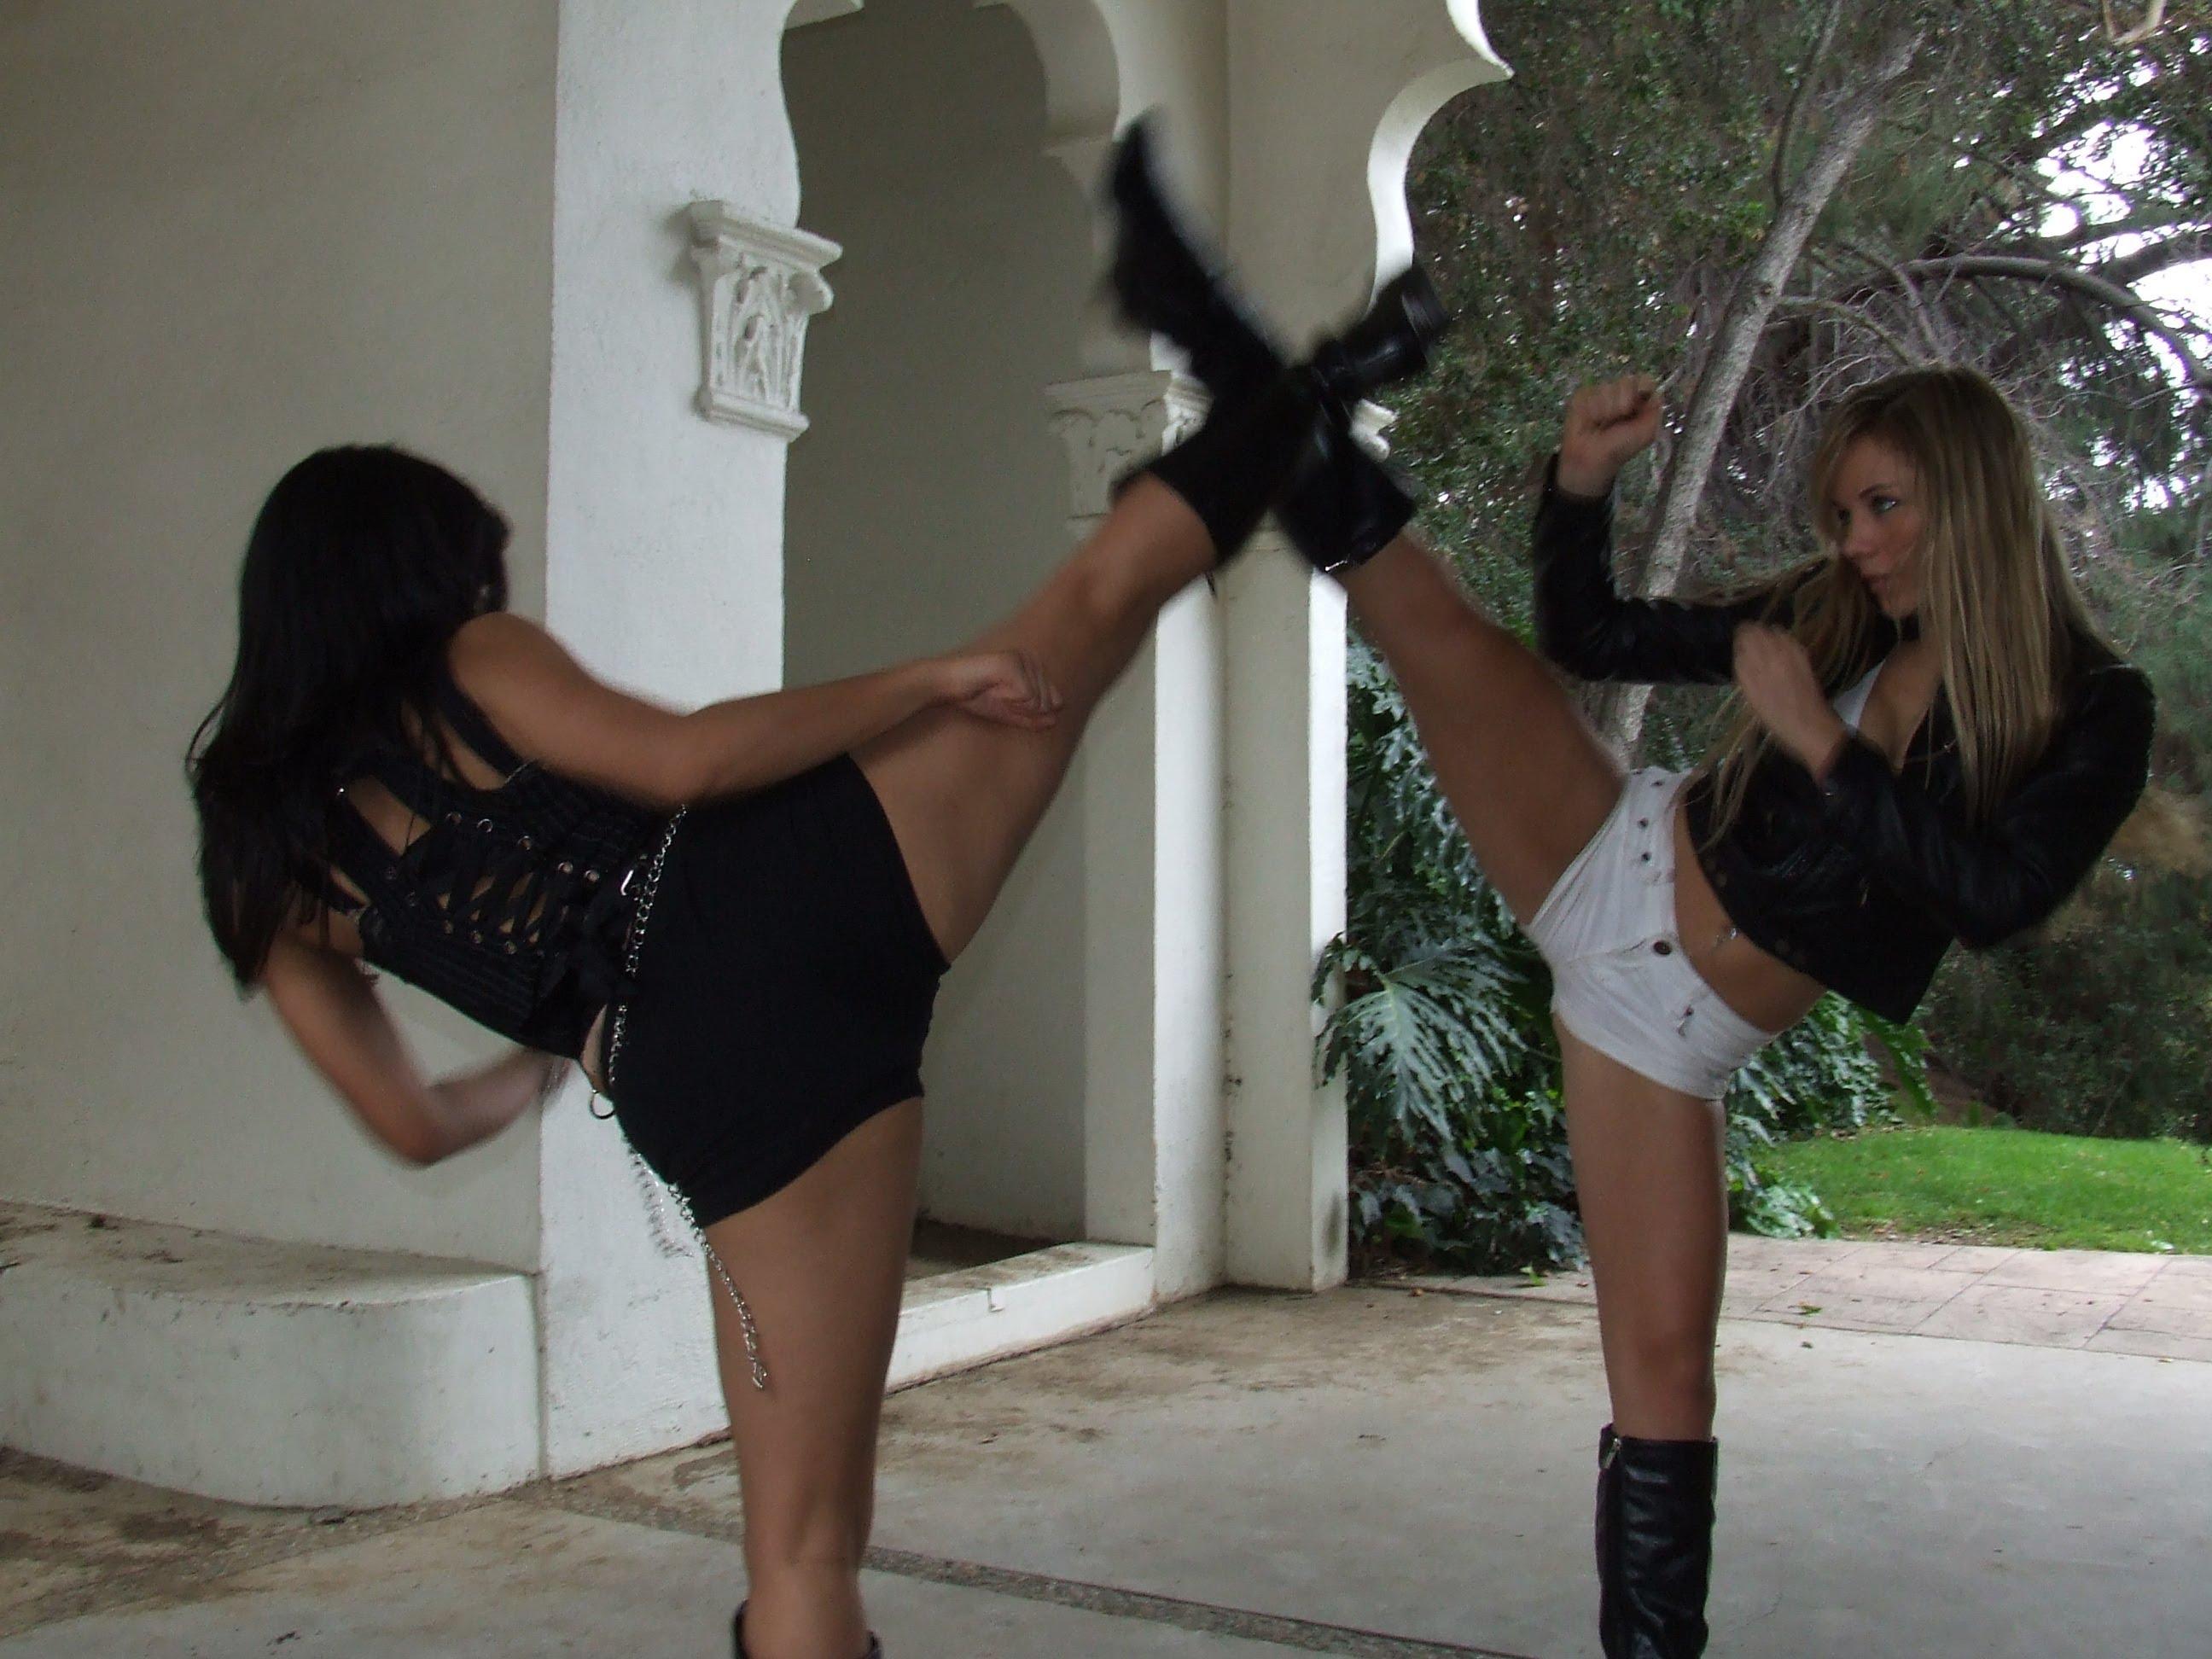 Female martial arts fetish 10 - 1 part 9